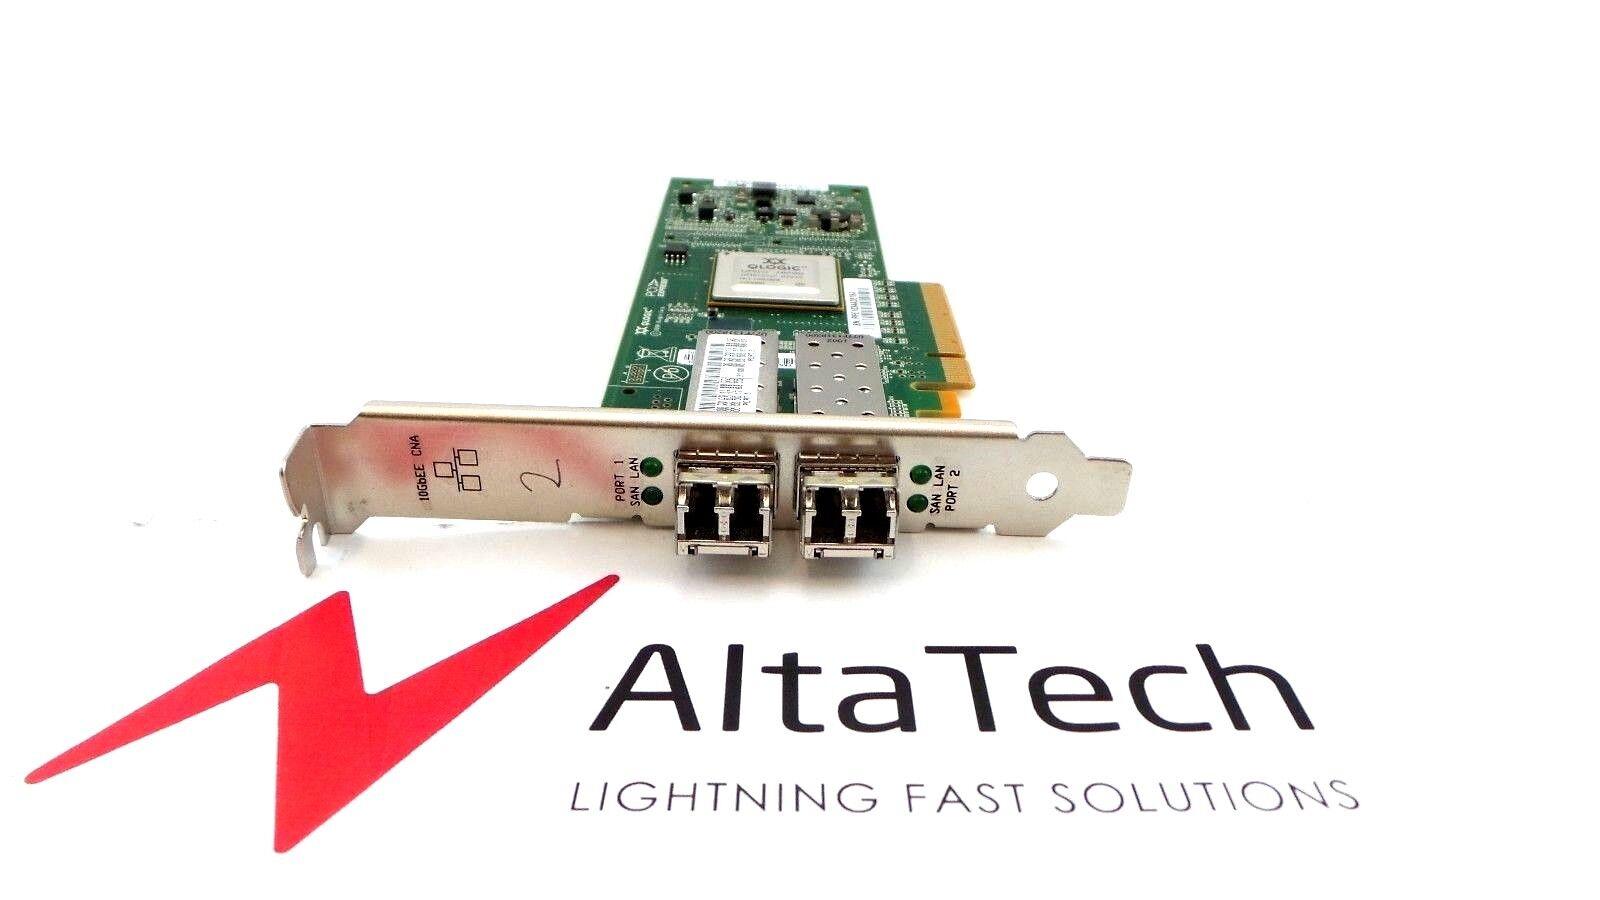 *New* IBM QLogic 42C1800 10Gb Dual Port CNA Card QLE8142-IBMX Network Adapter